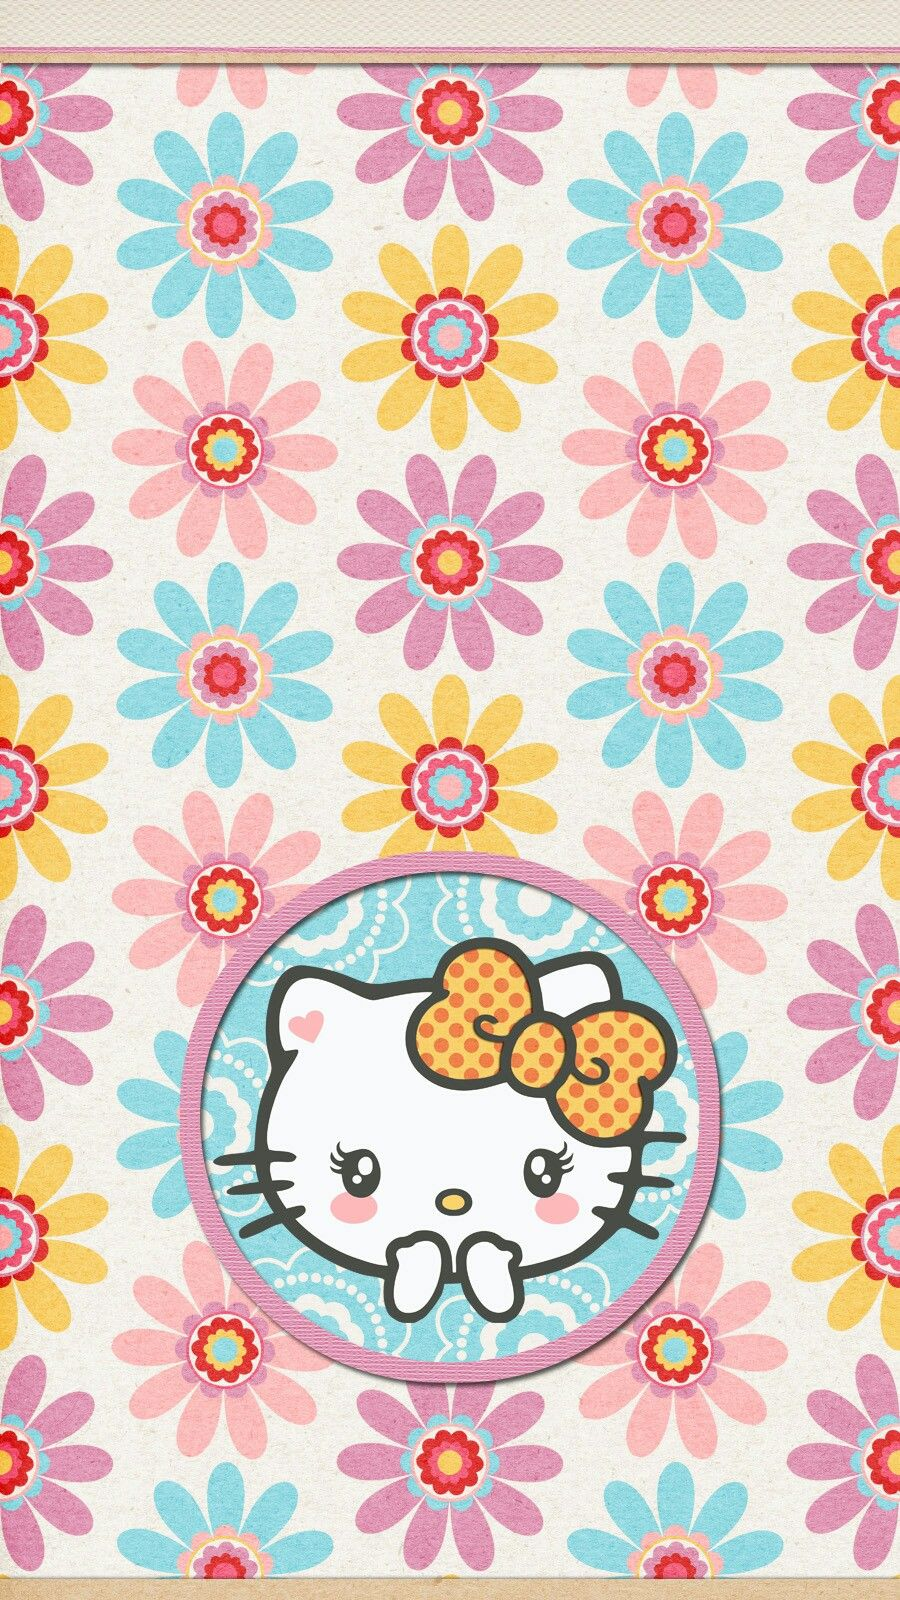 Cool Wallpaper Hello Kitty Floral - a0528254d15095cf554e3eb79843b147  Trends_809689.jpg